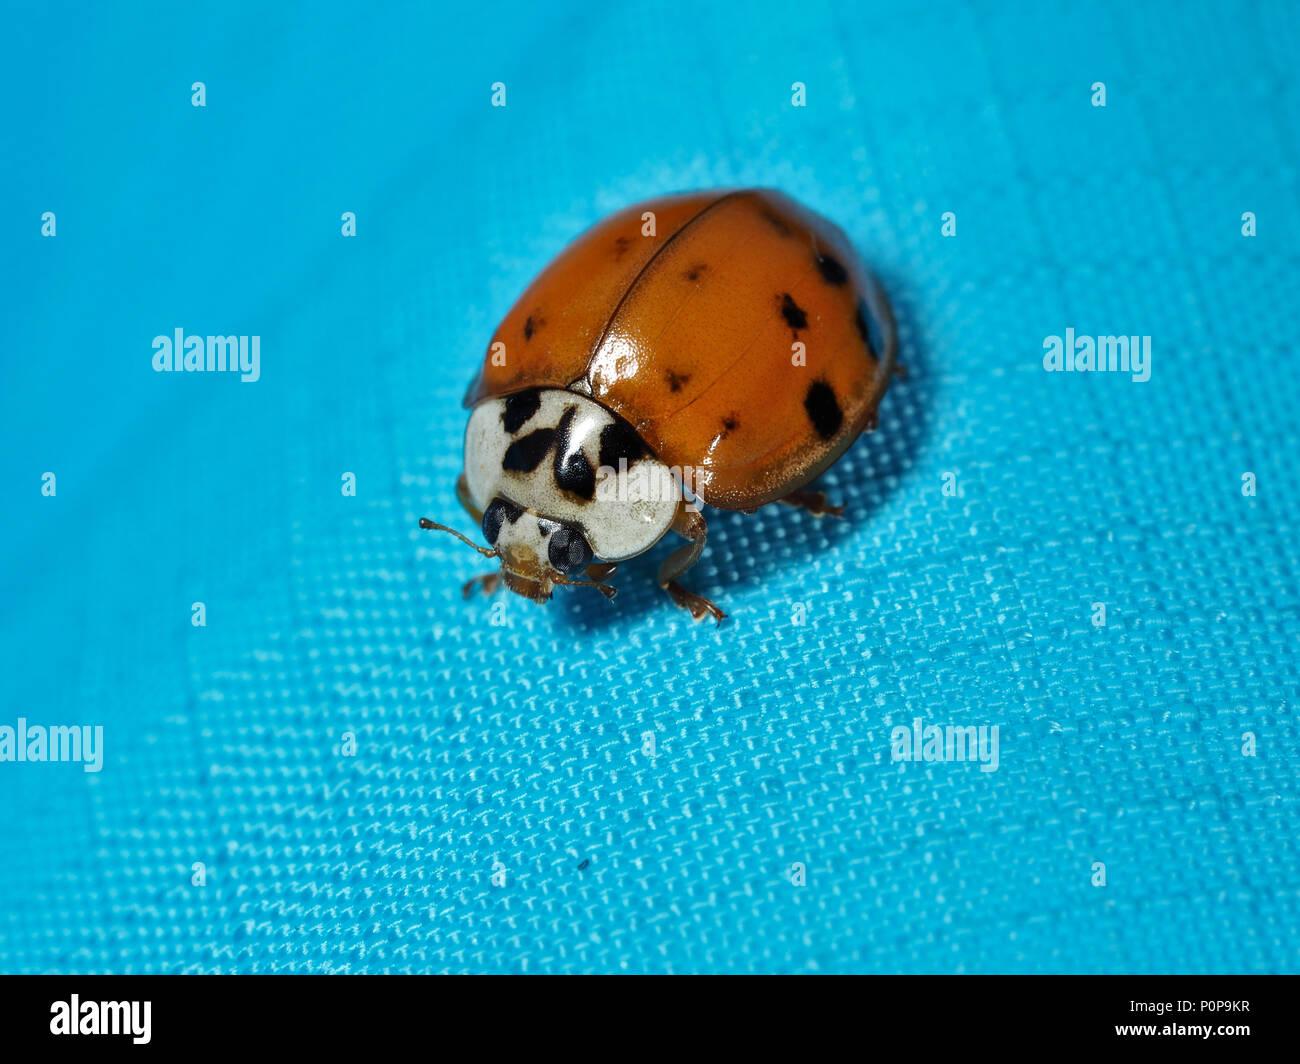 Asian ladybeetle (Harmonia axyridis) on a blue fabric, close-up view Stock Photo